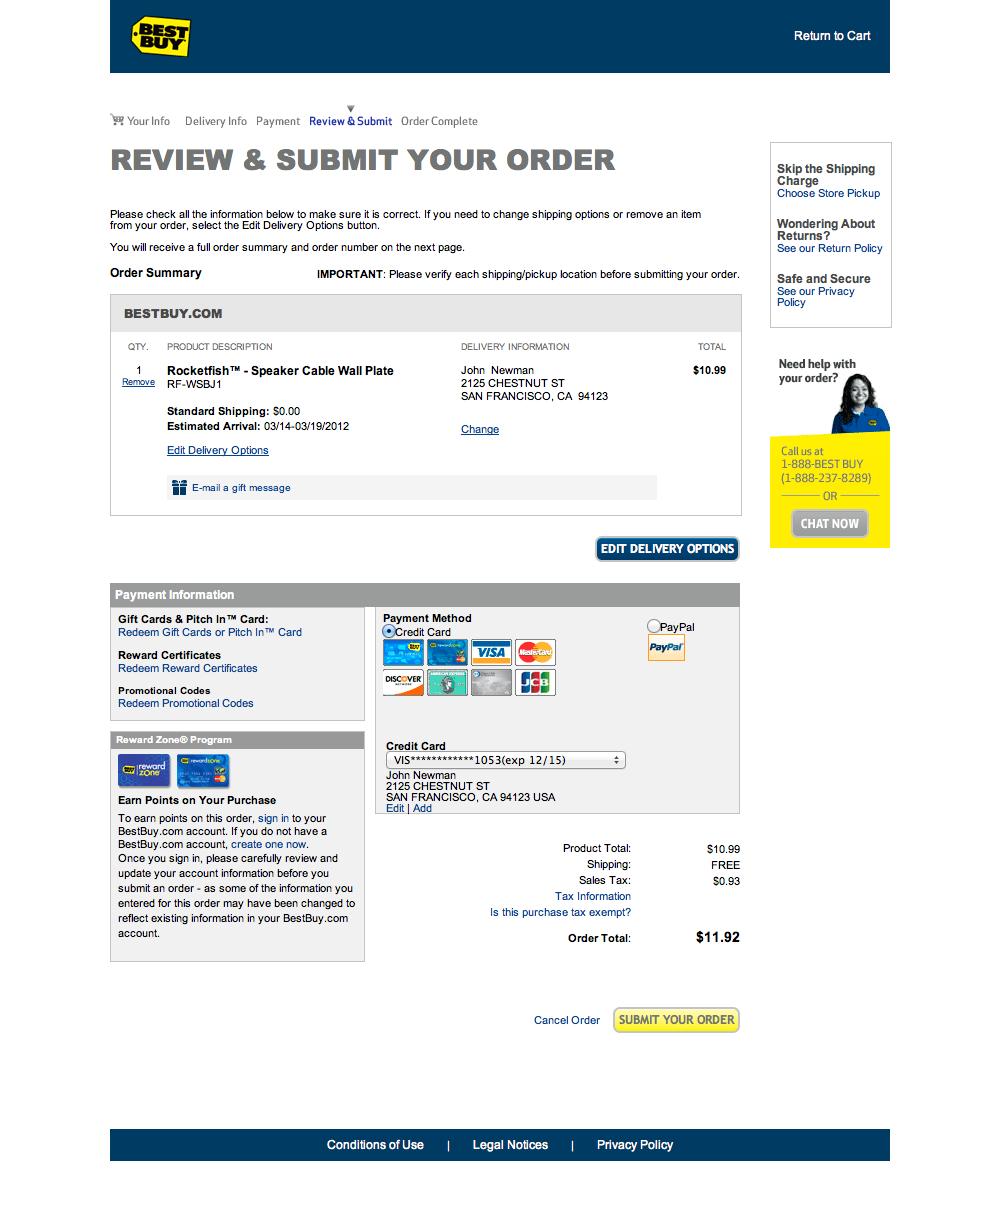 Best buy customer centricity case study analysis